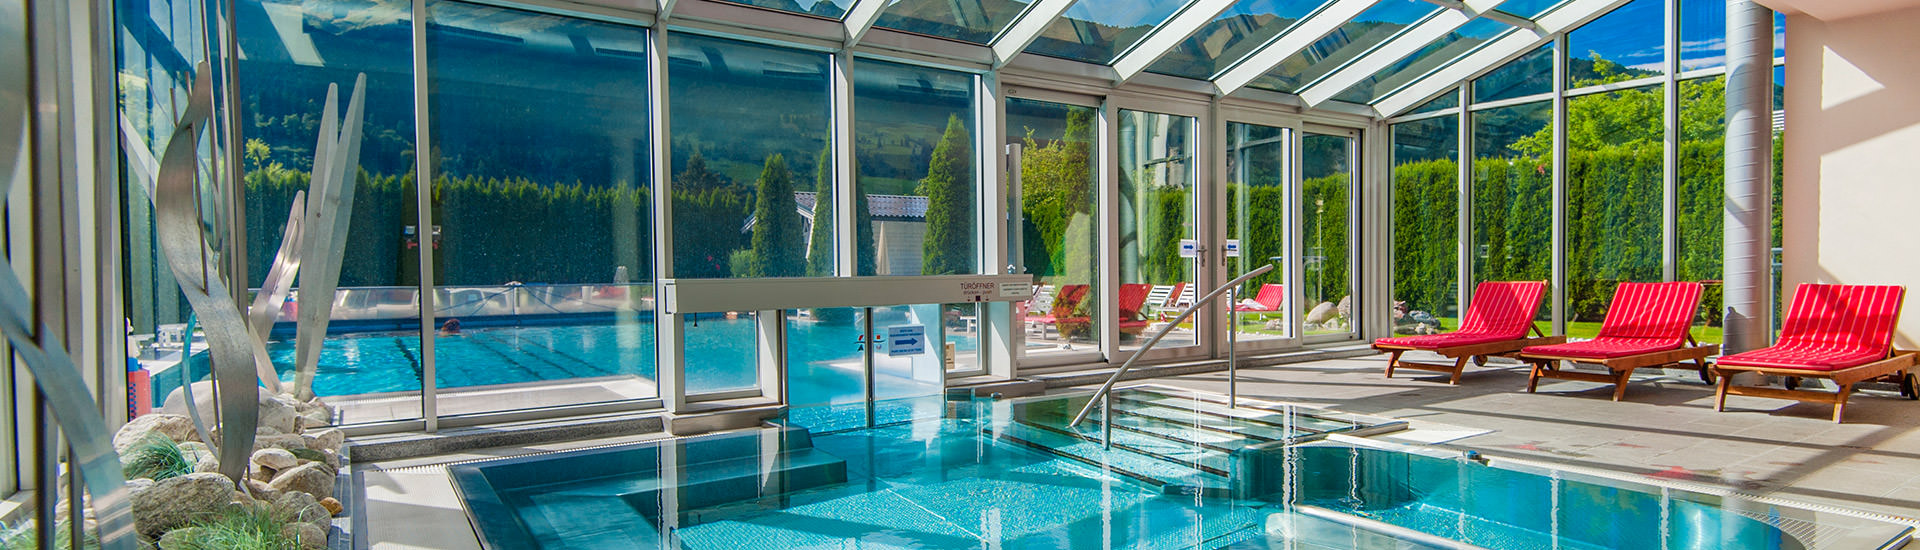 Hotel Impuls Tirol Wellness